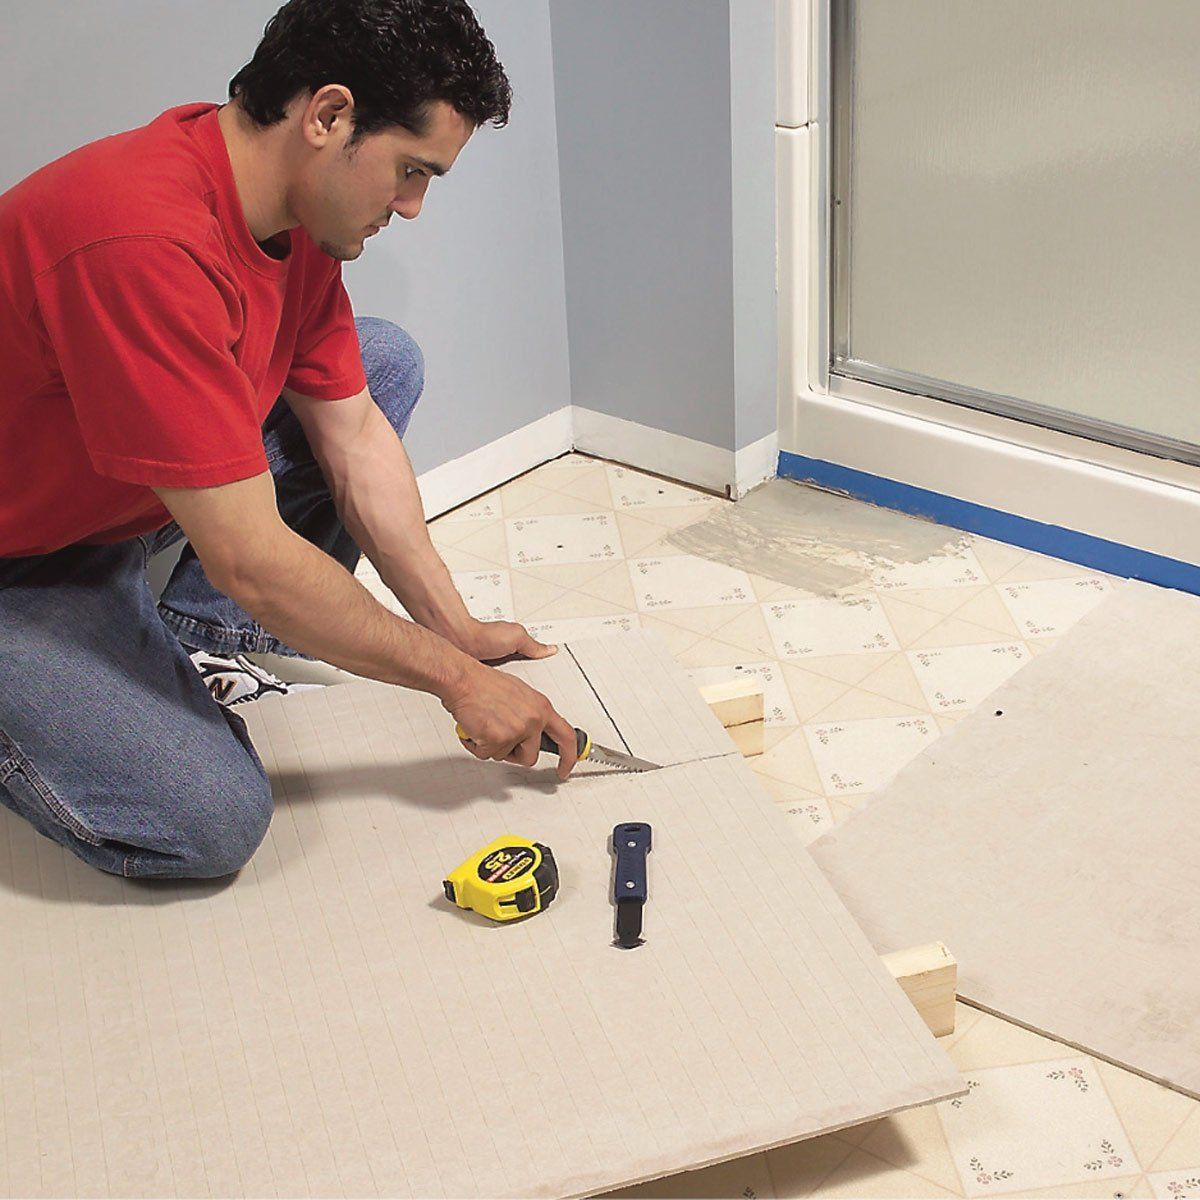 How To Install Ceramic Tile Floor In The Bathroom Ceramic Floor Tiles Tile Repair Installing Tile Floor